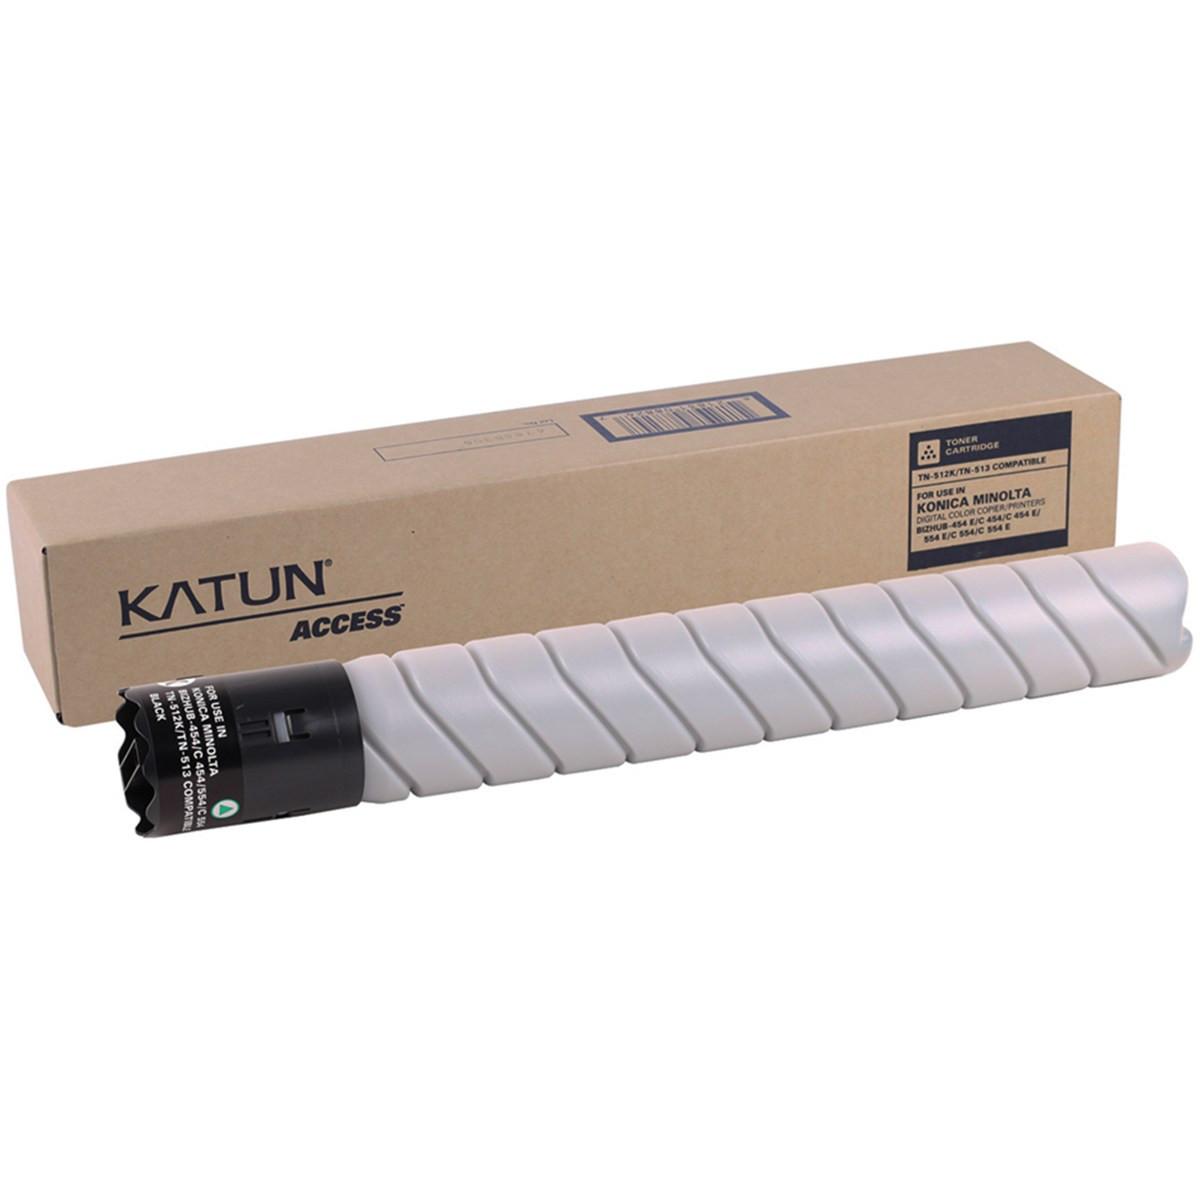 Toner Konica Minolta TN-324K TN512K Preto   Bizhub C454 C554 C258 C308 C368   Katun Access 544g